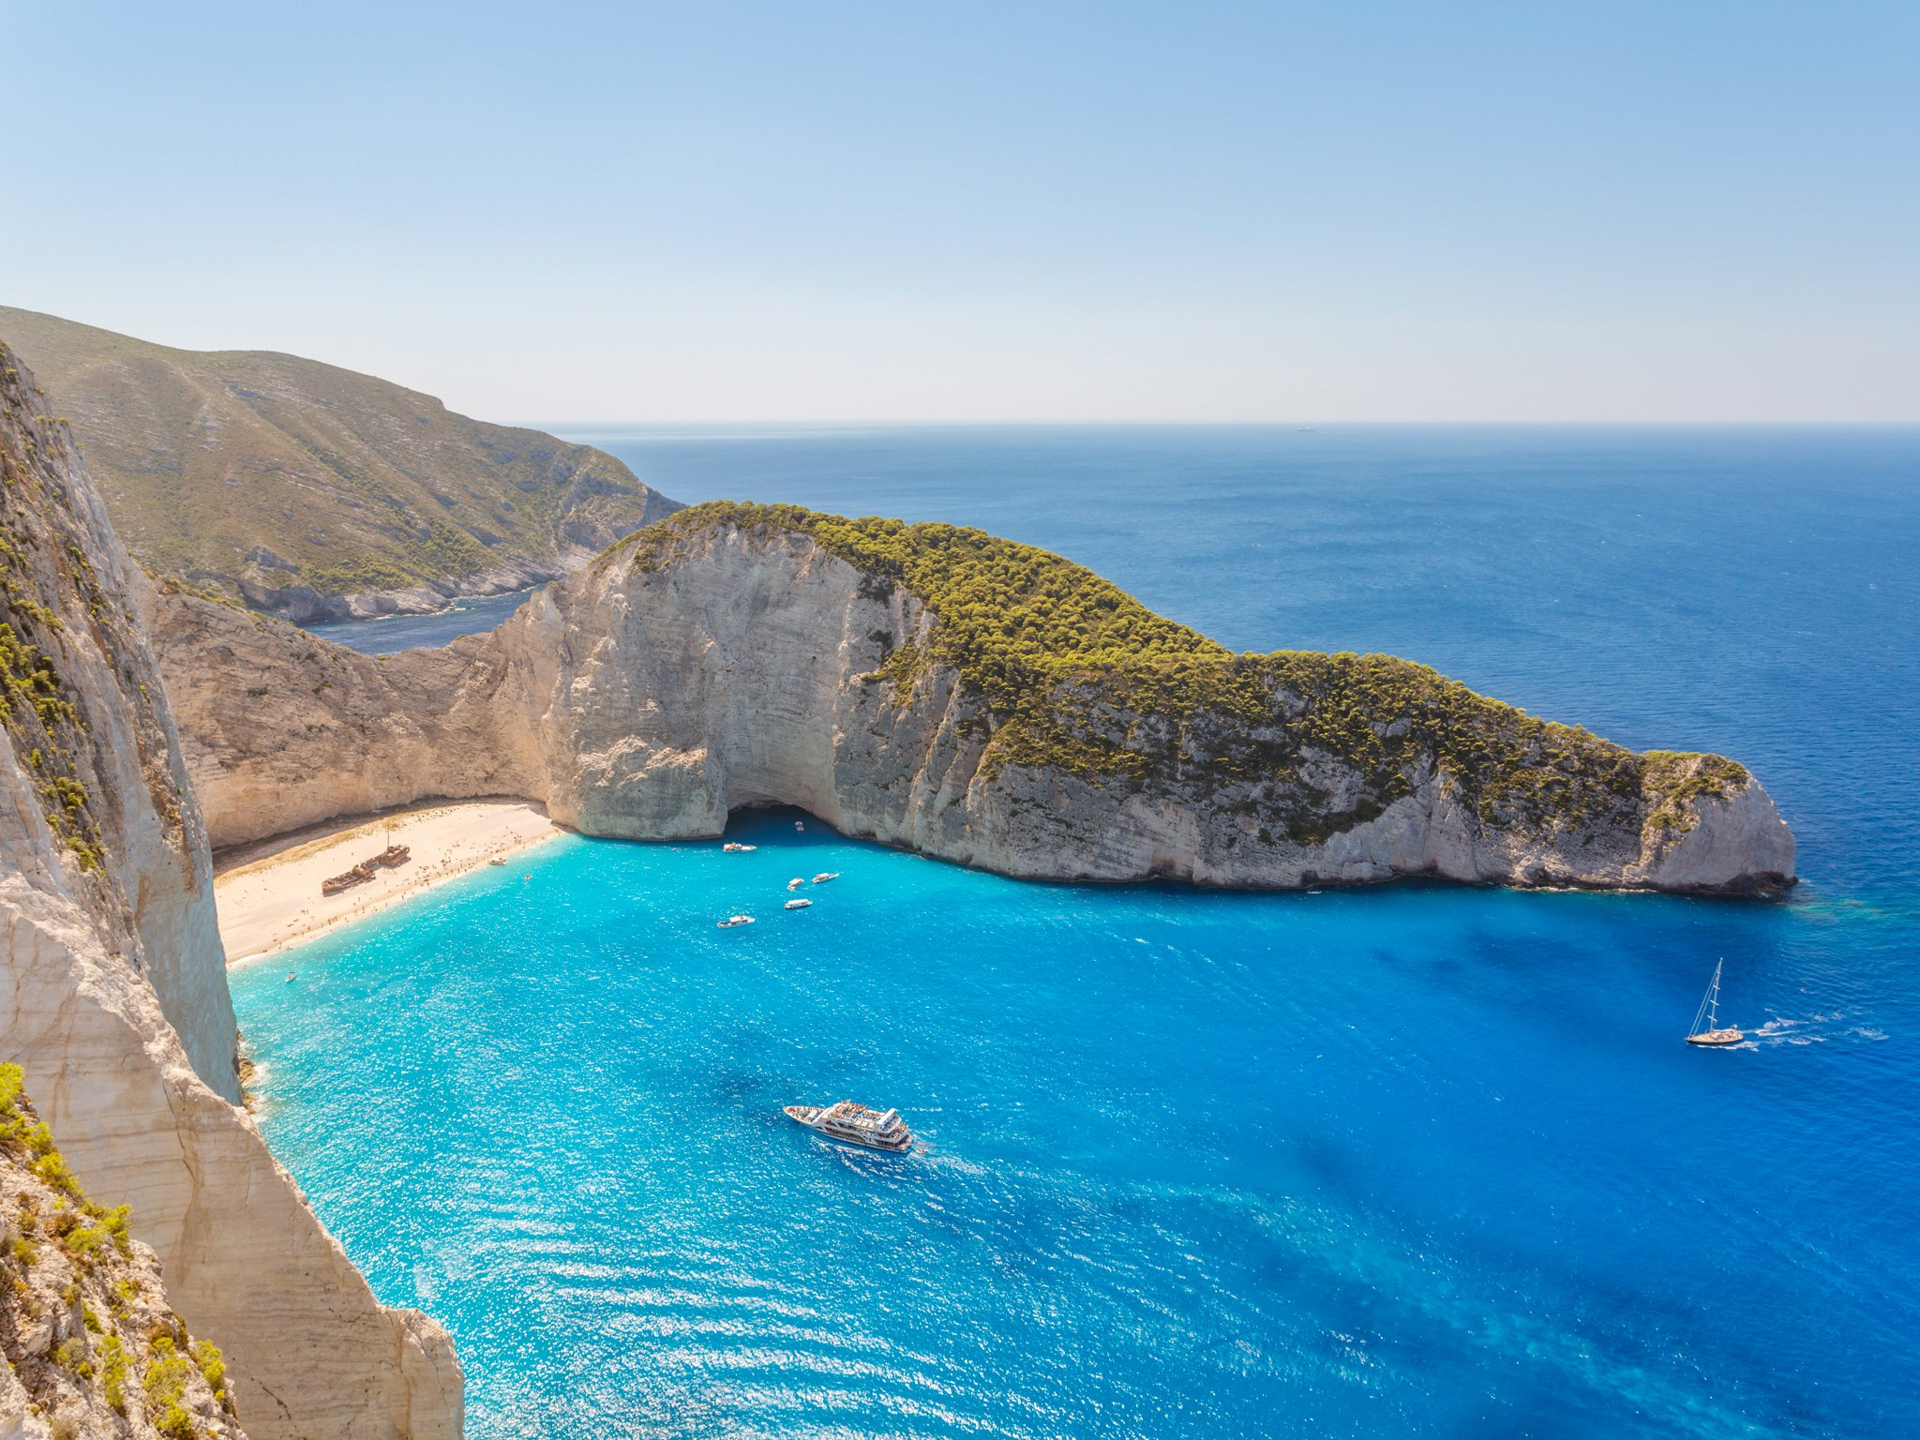 3. Пляж Наваджио, остров Закинтос, Греция.